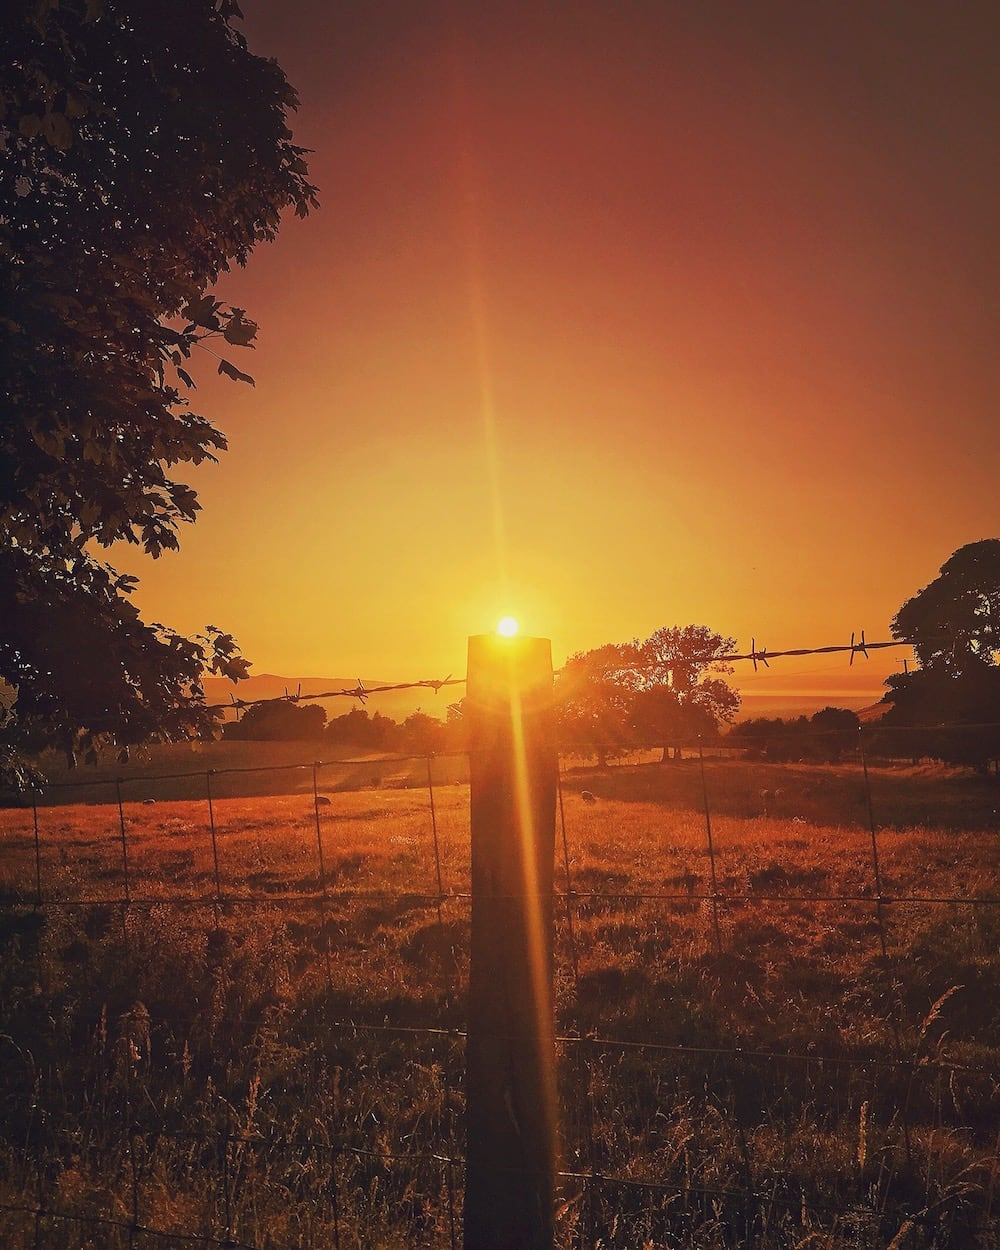 Glan Clwyd Isa   Denbighshire Sunsets 3   thefrozendivide